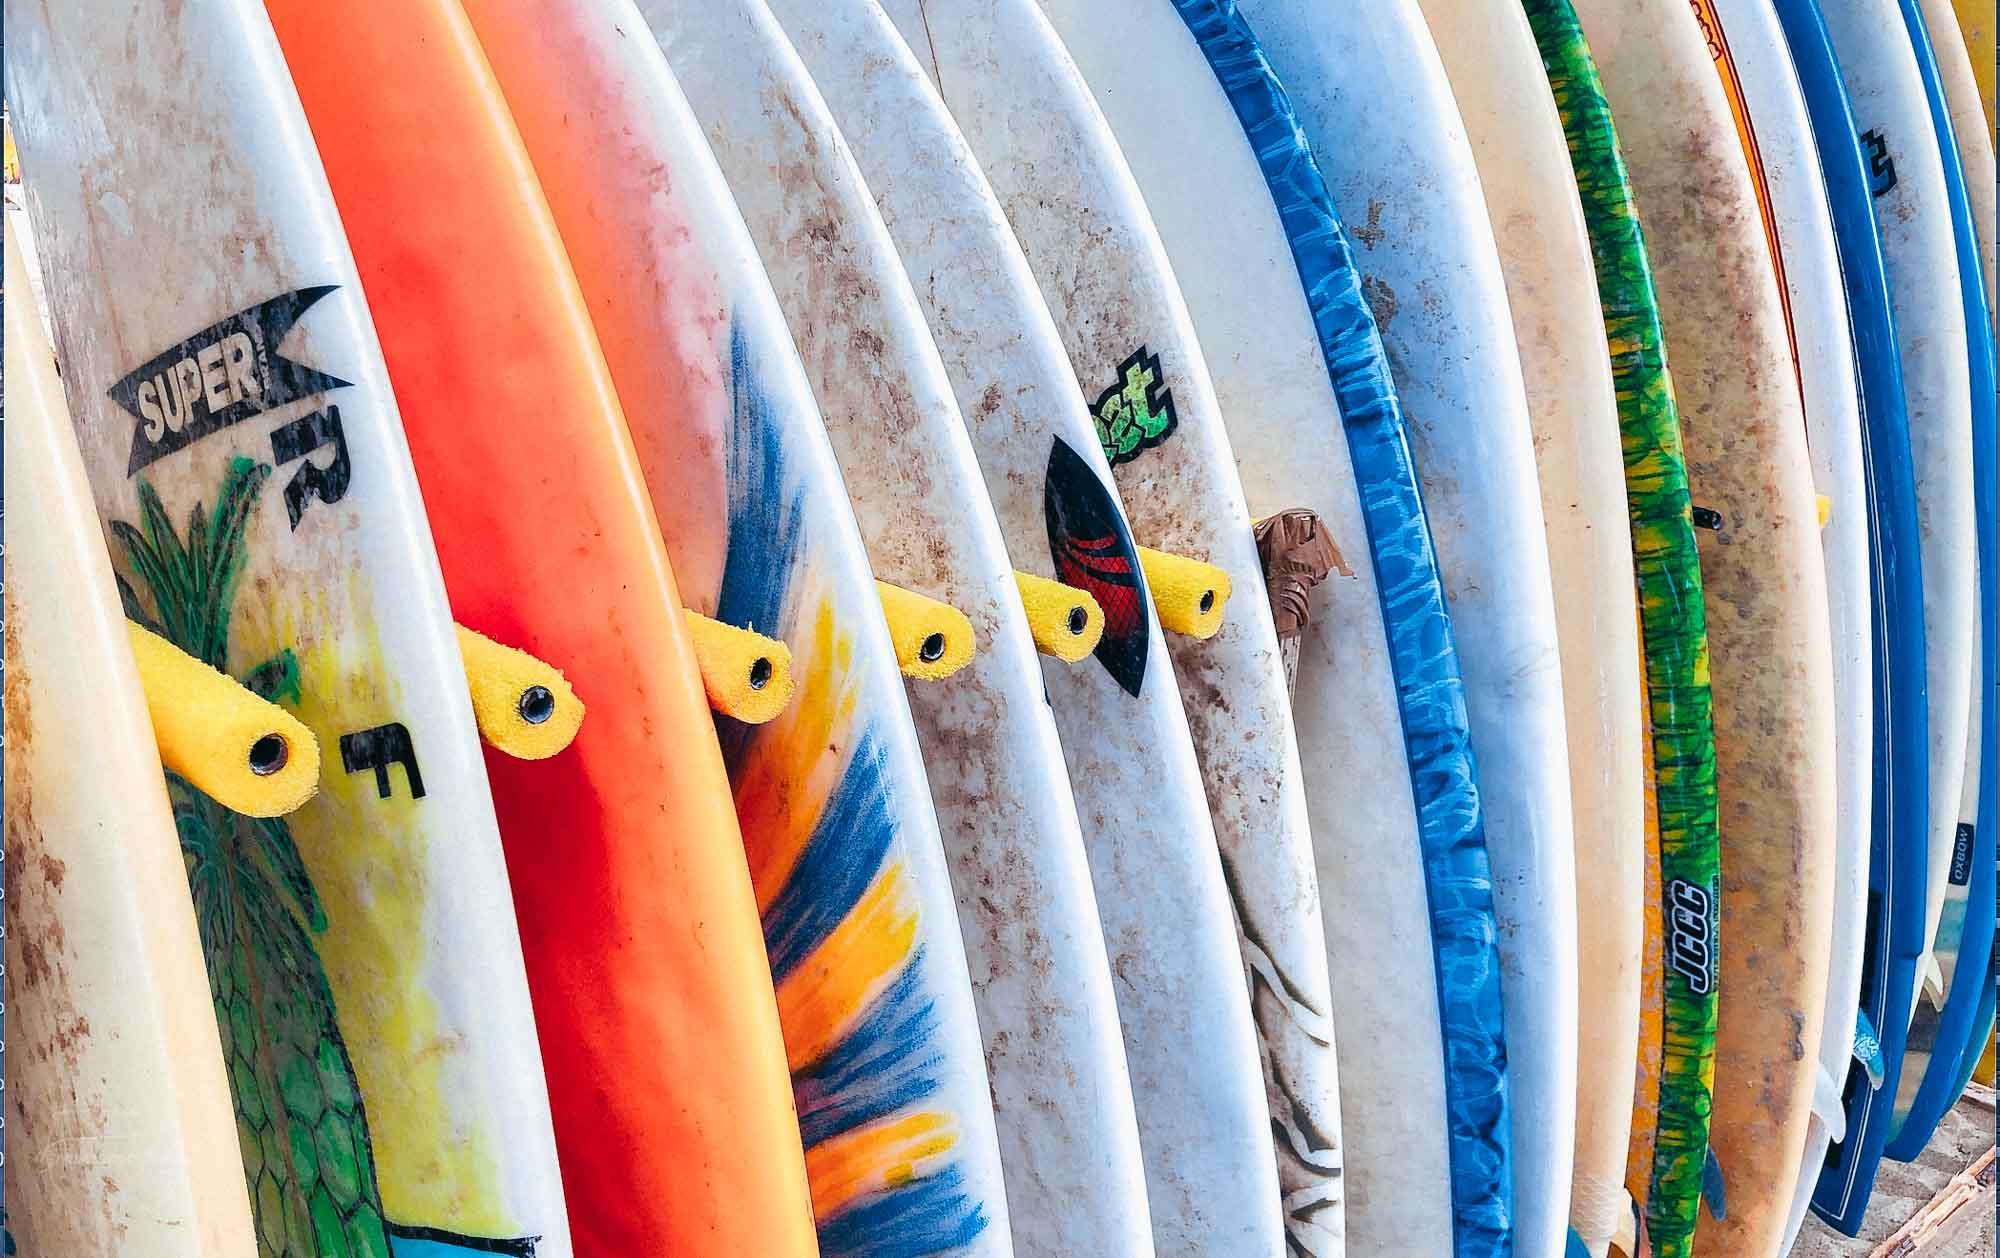 Colorful boards used to go kite surfing in Cabarete, Dominican Republic.